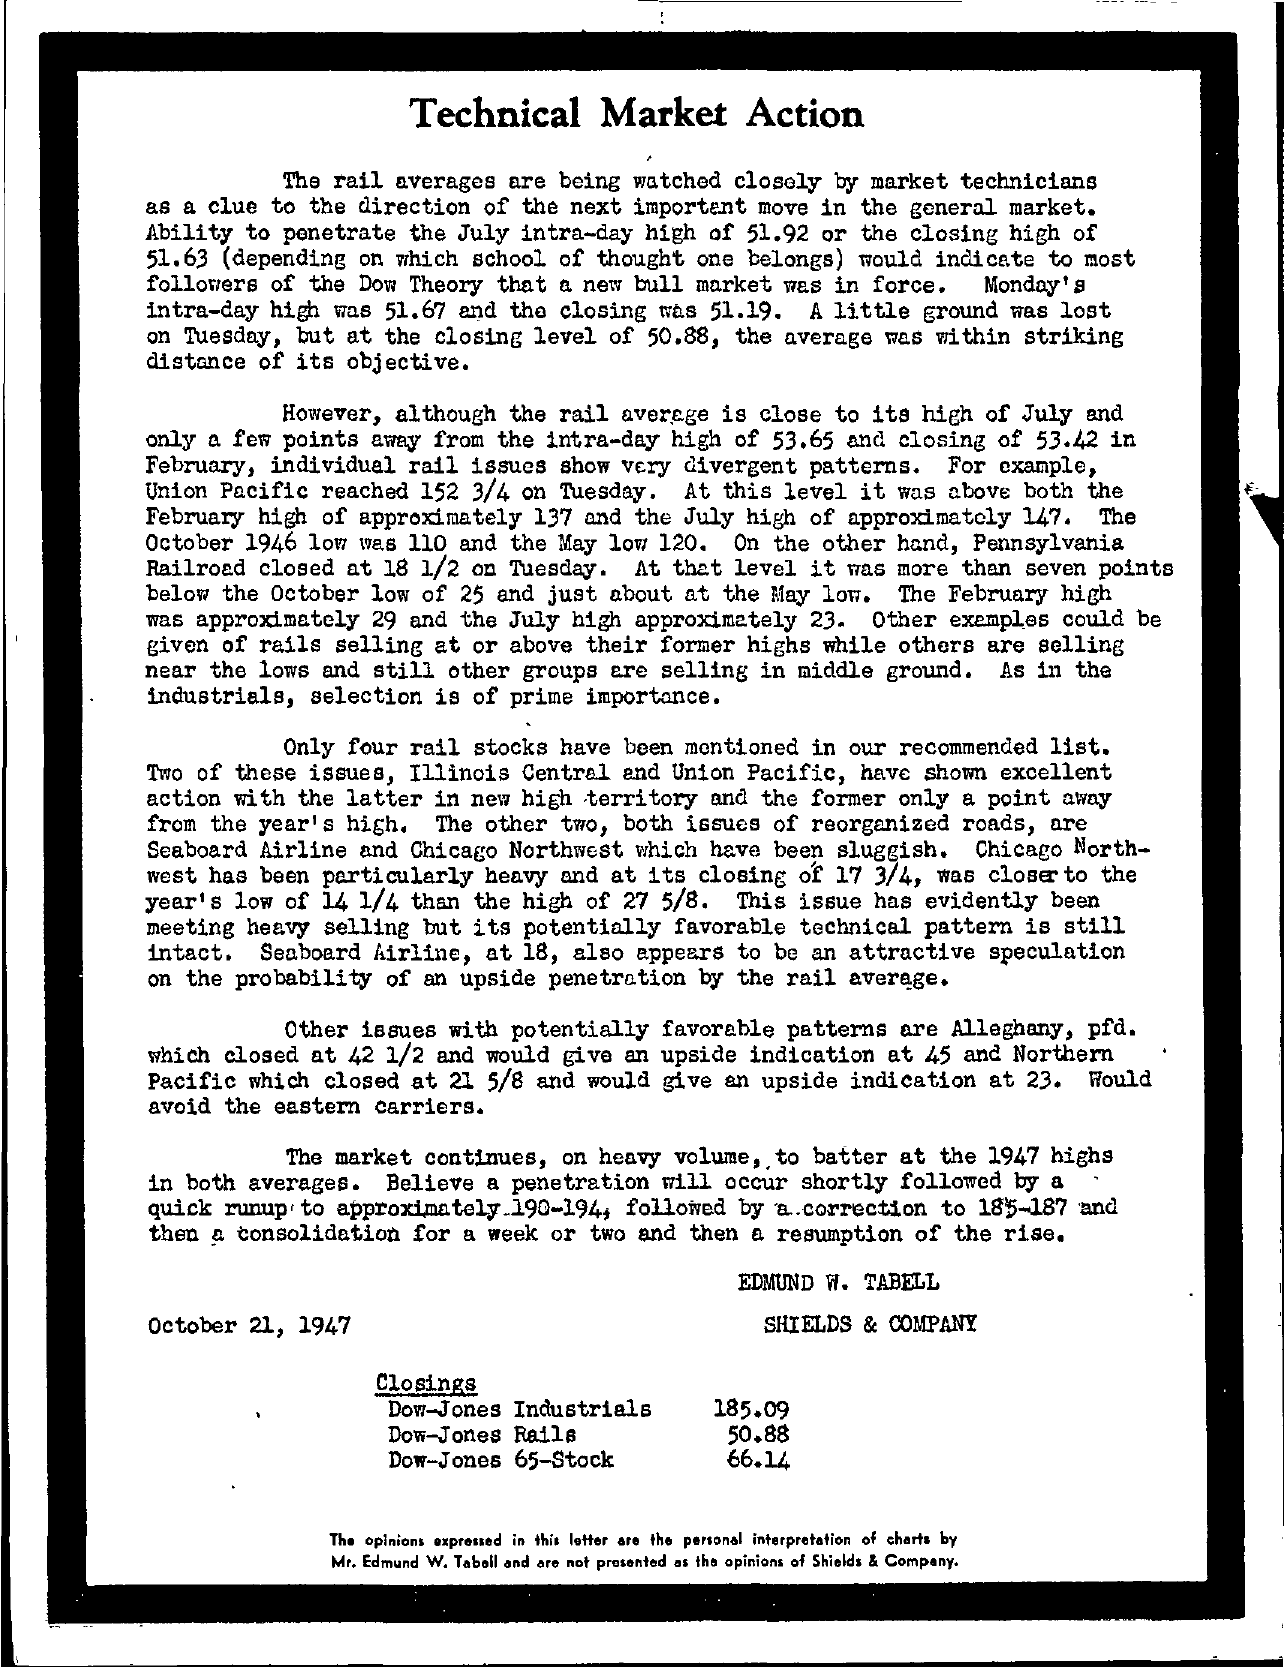 Tabell's Market Letter - October 21, 1947